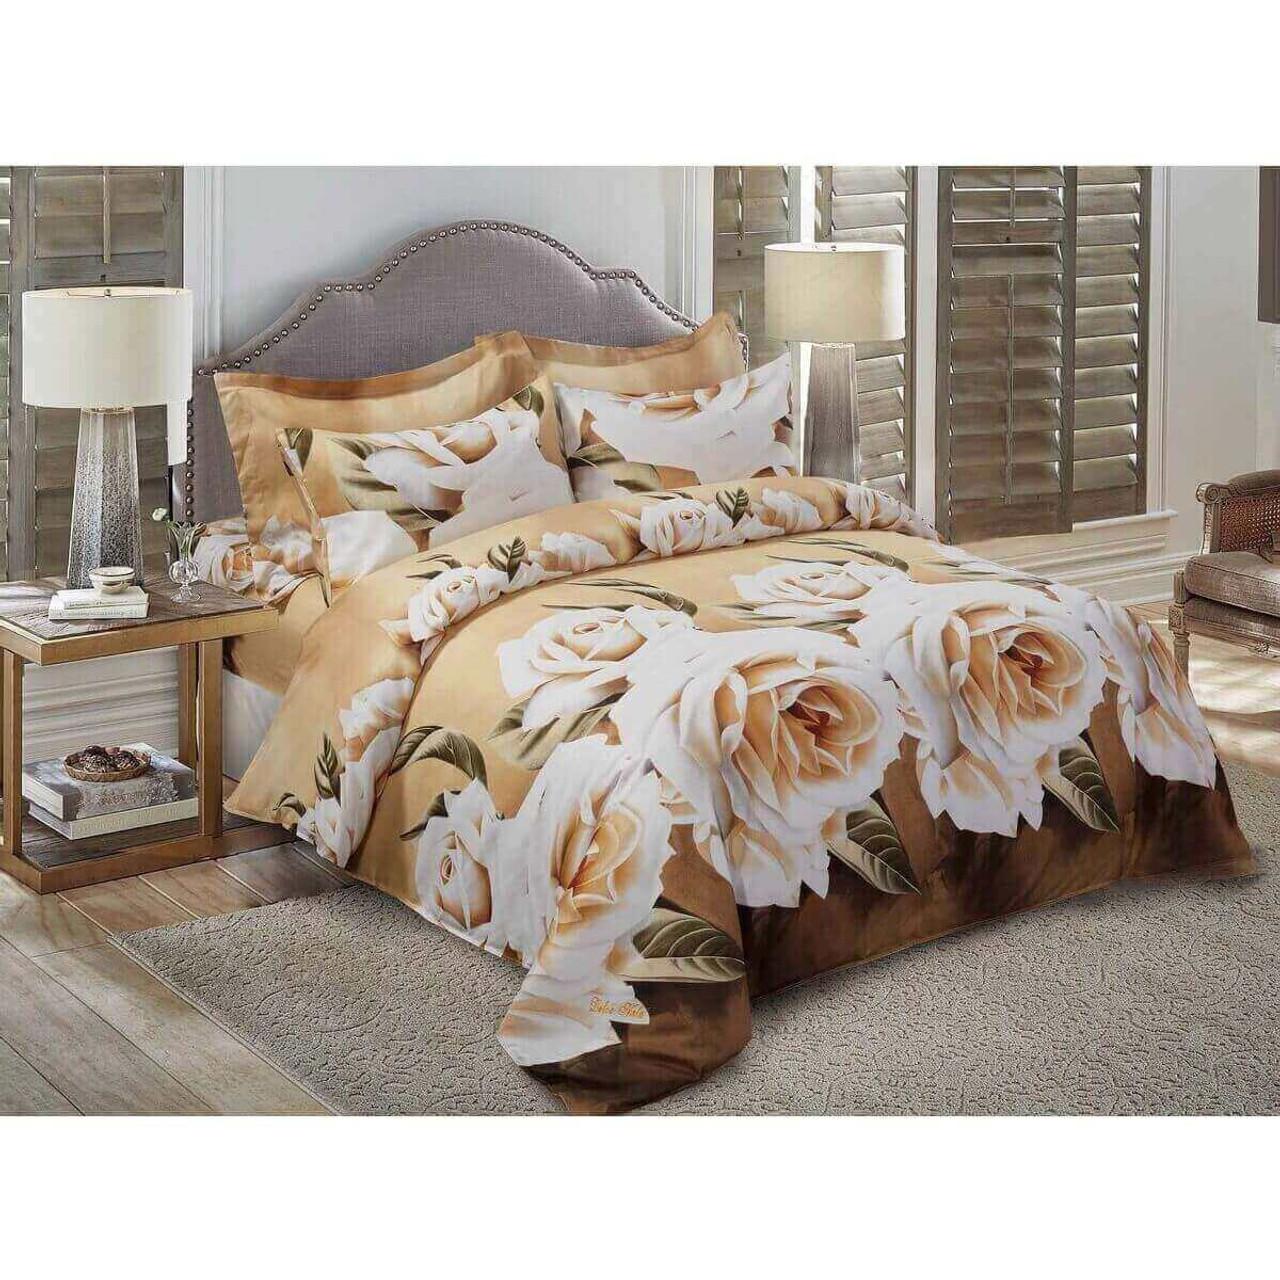 Drop-shipping Wholesale Bedding Sets DM710Q